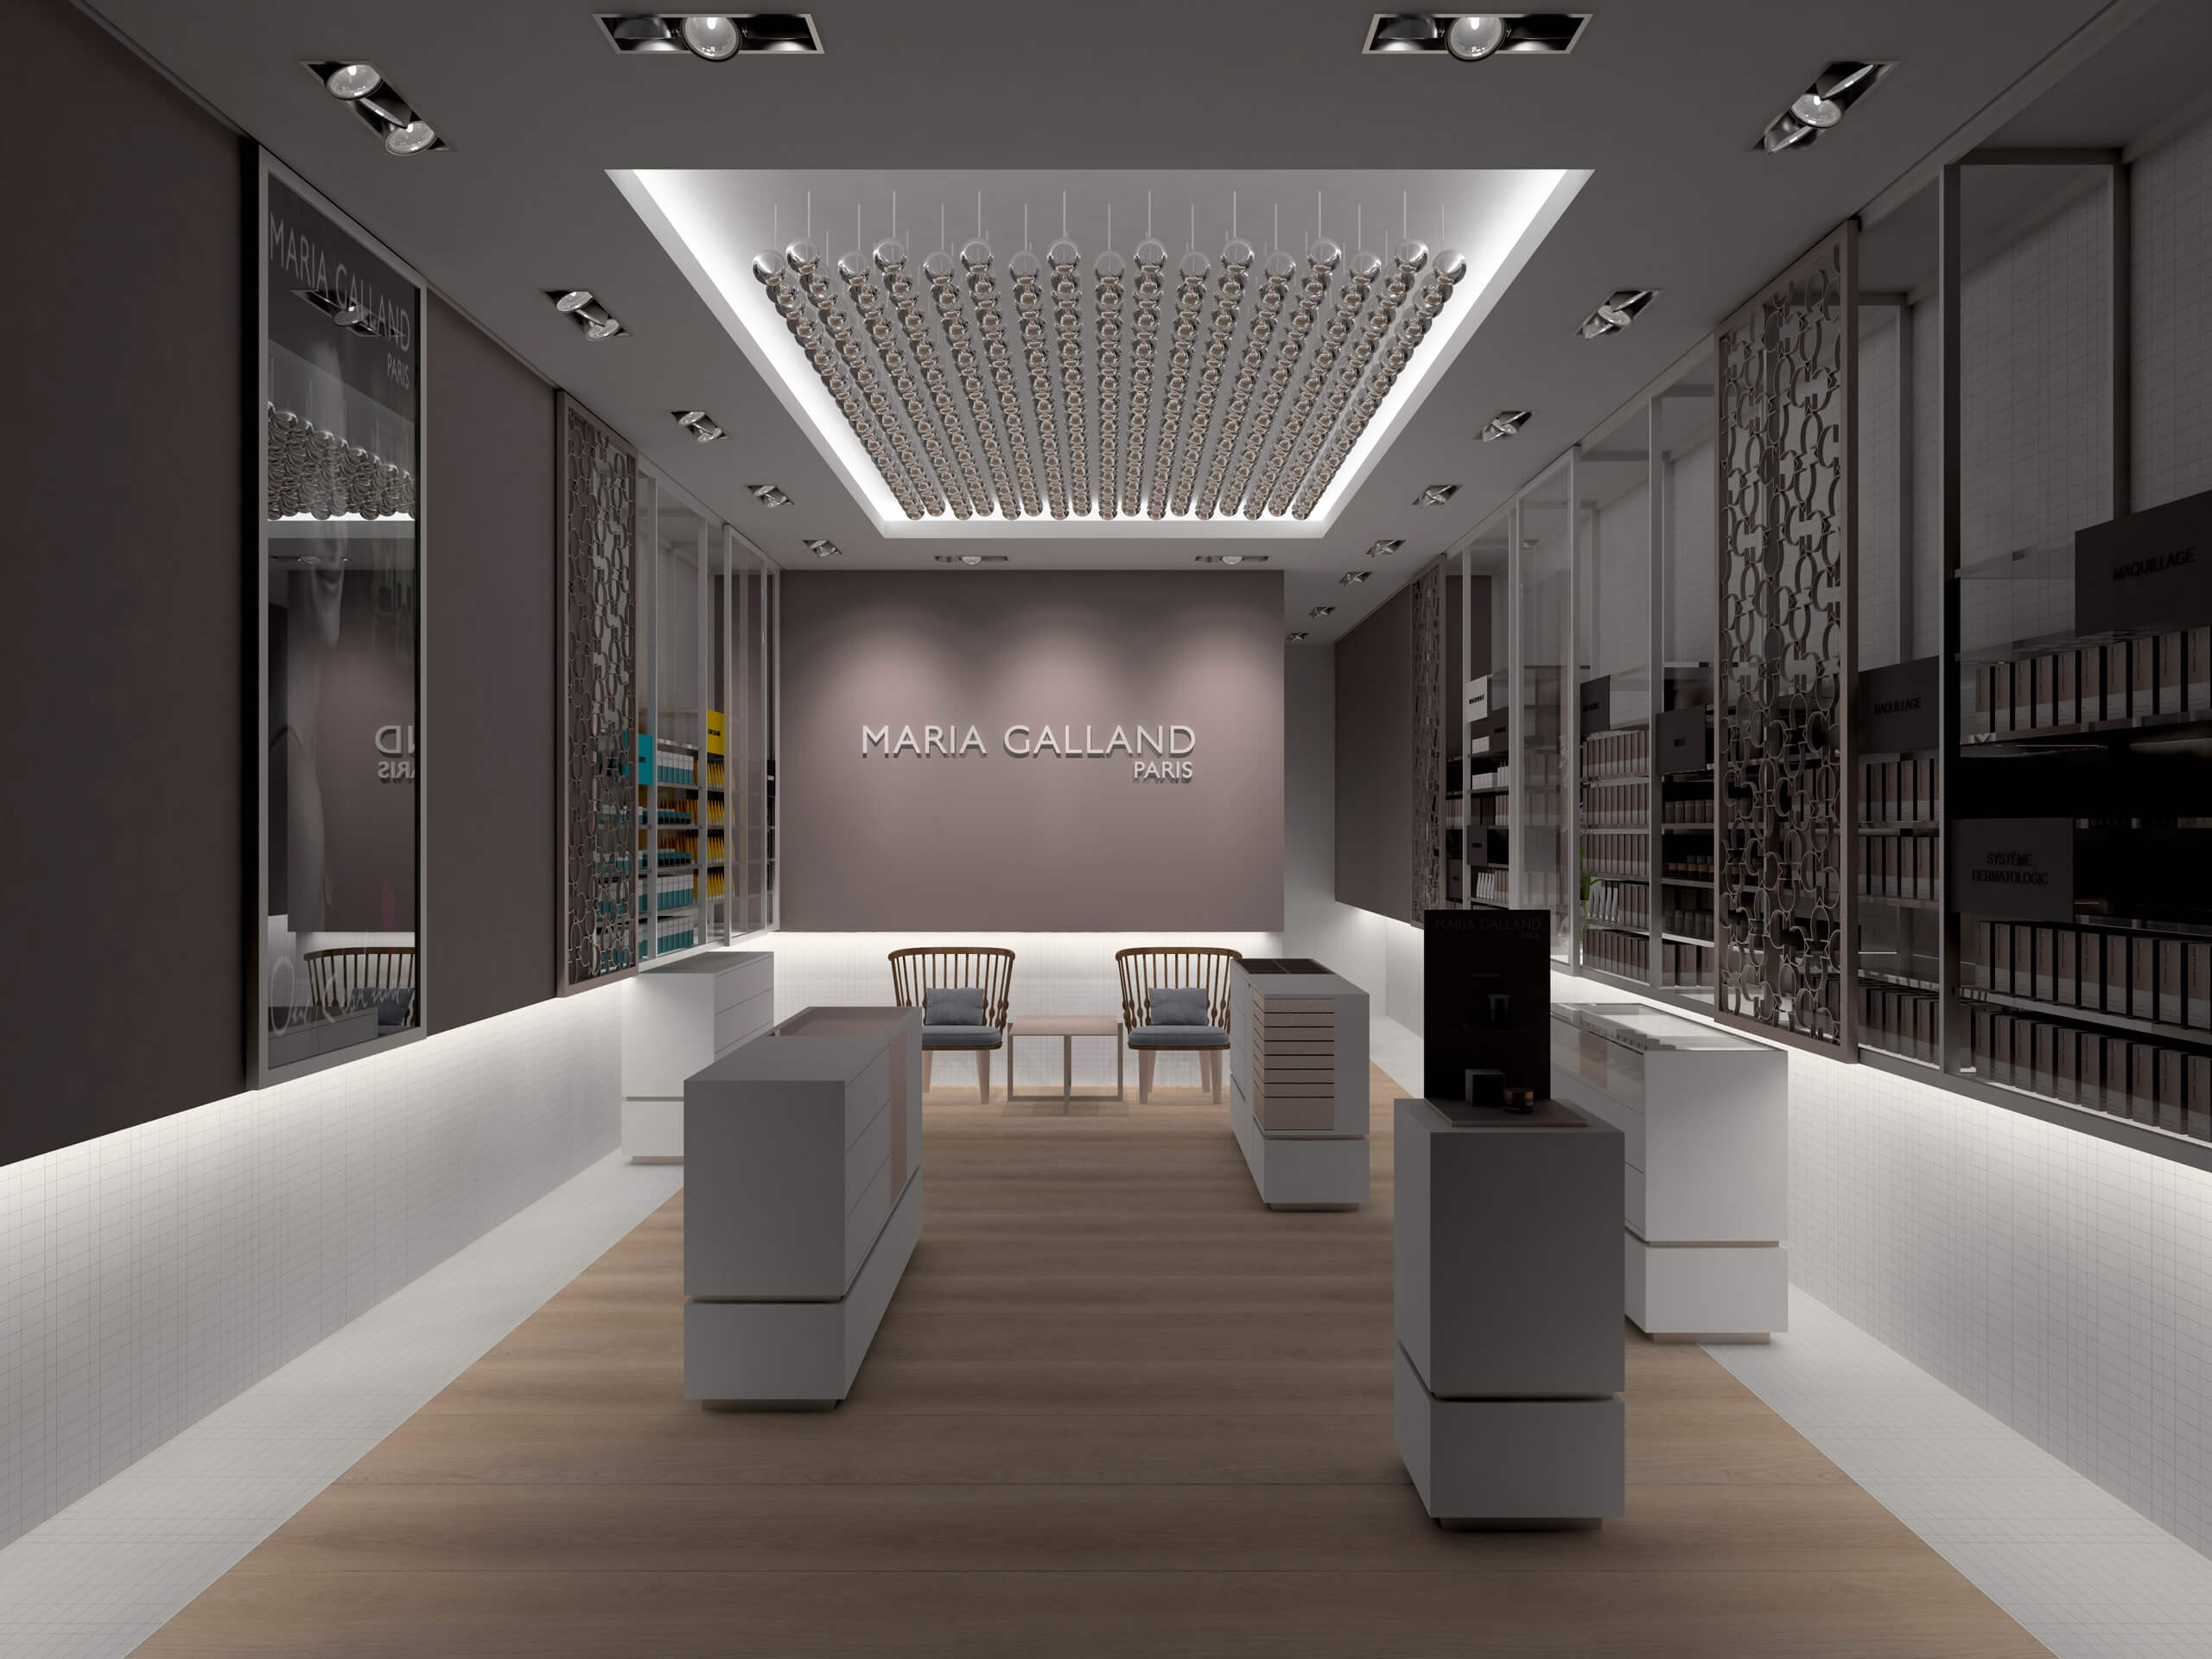 maria-galland-shop-concept-3